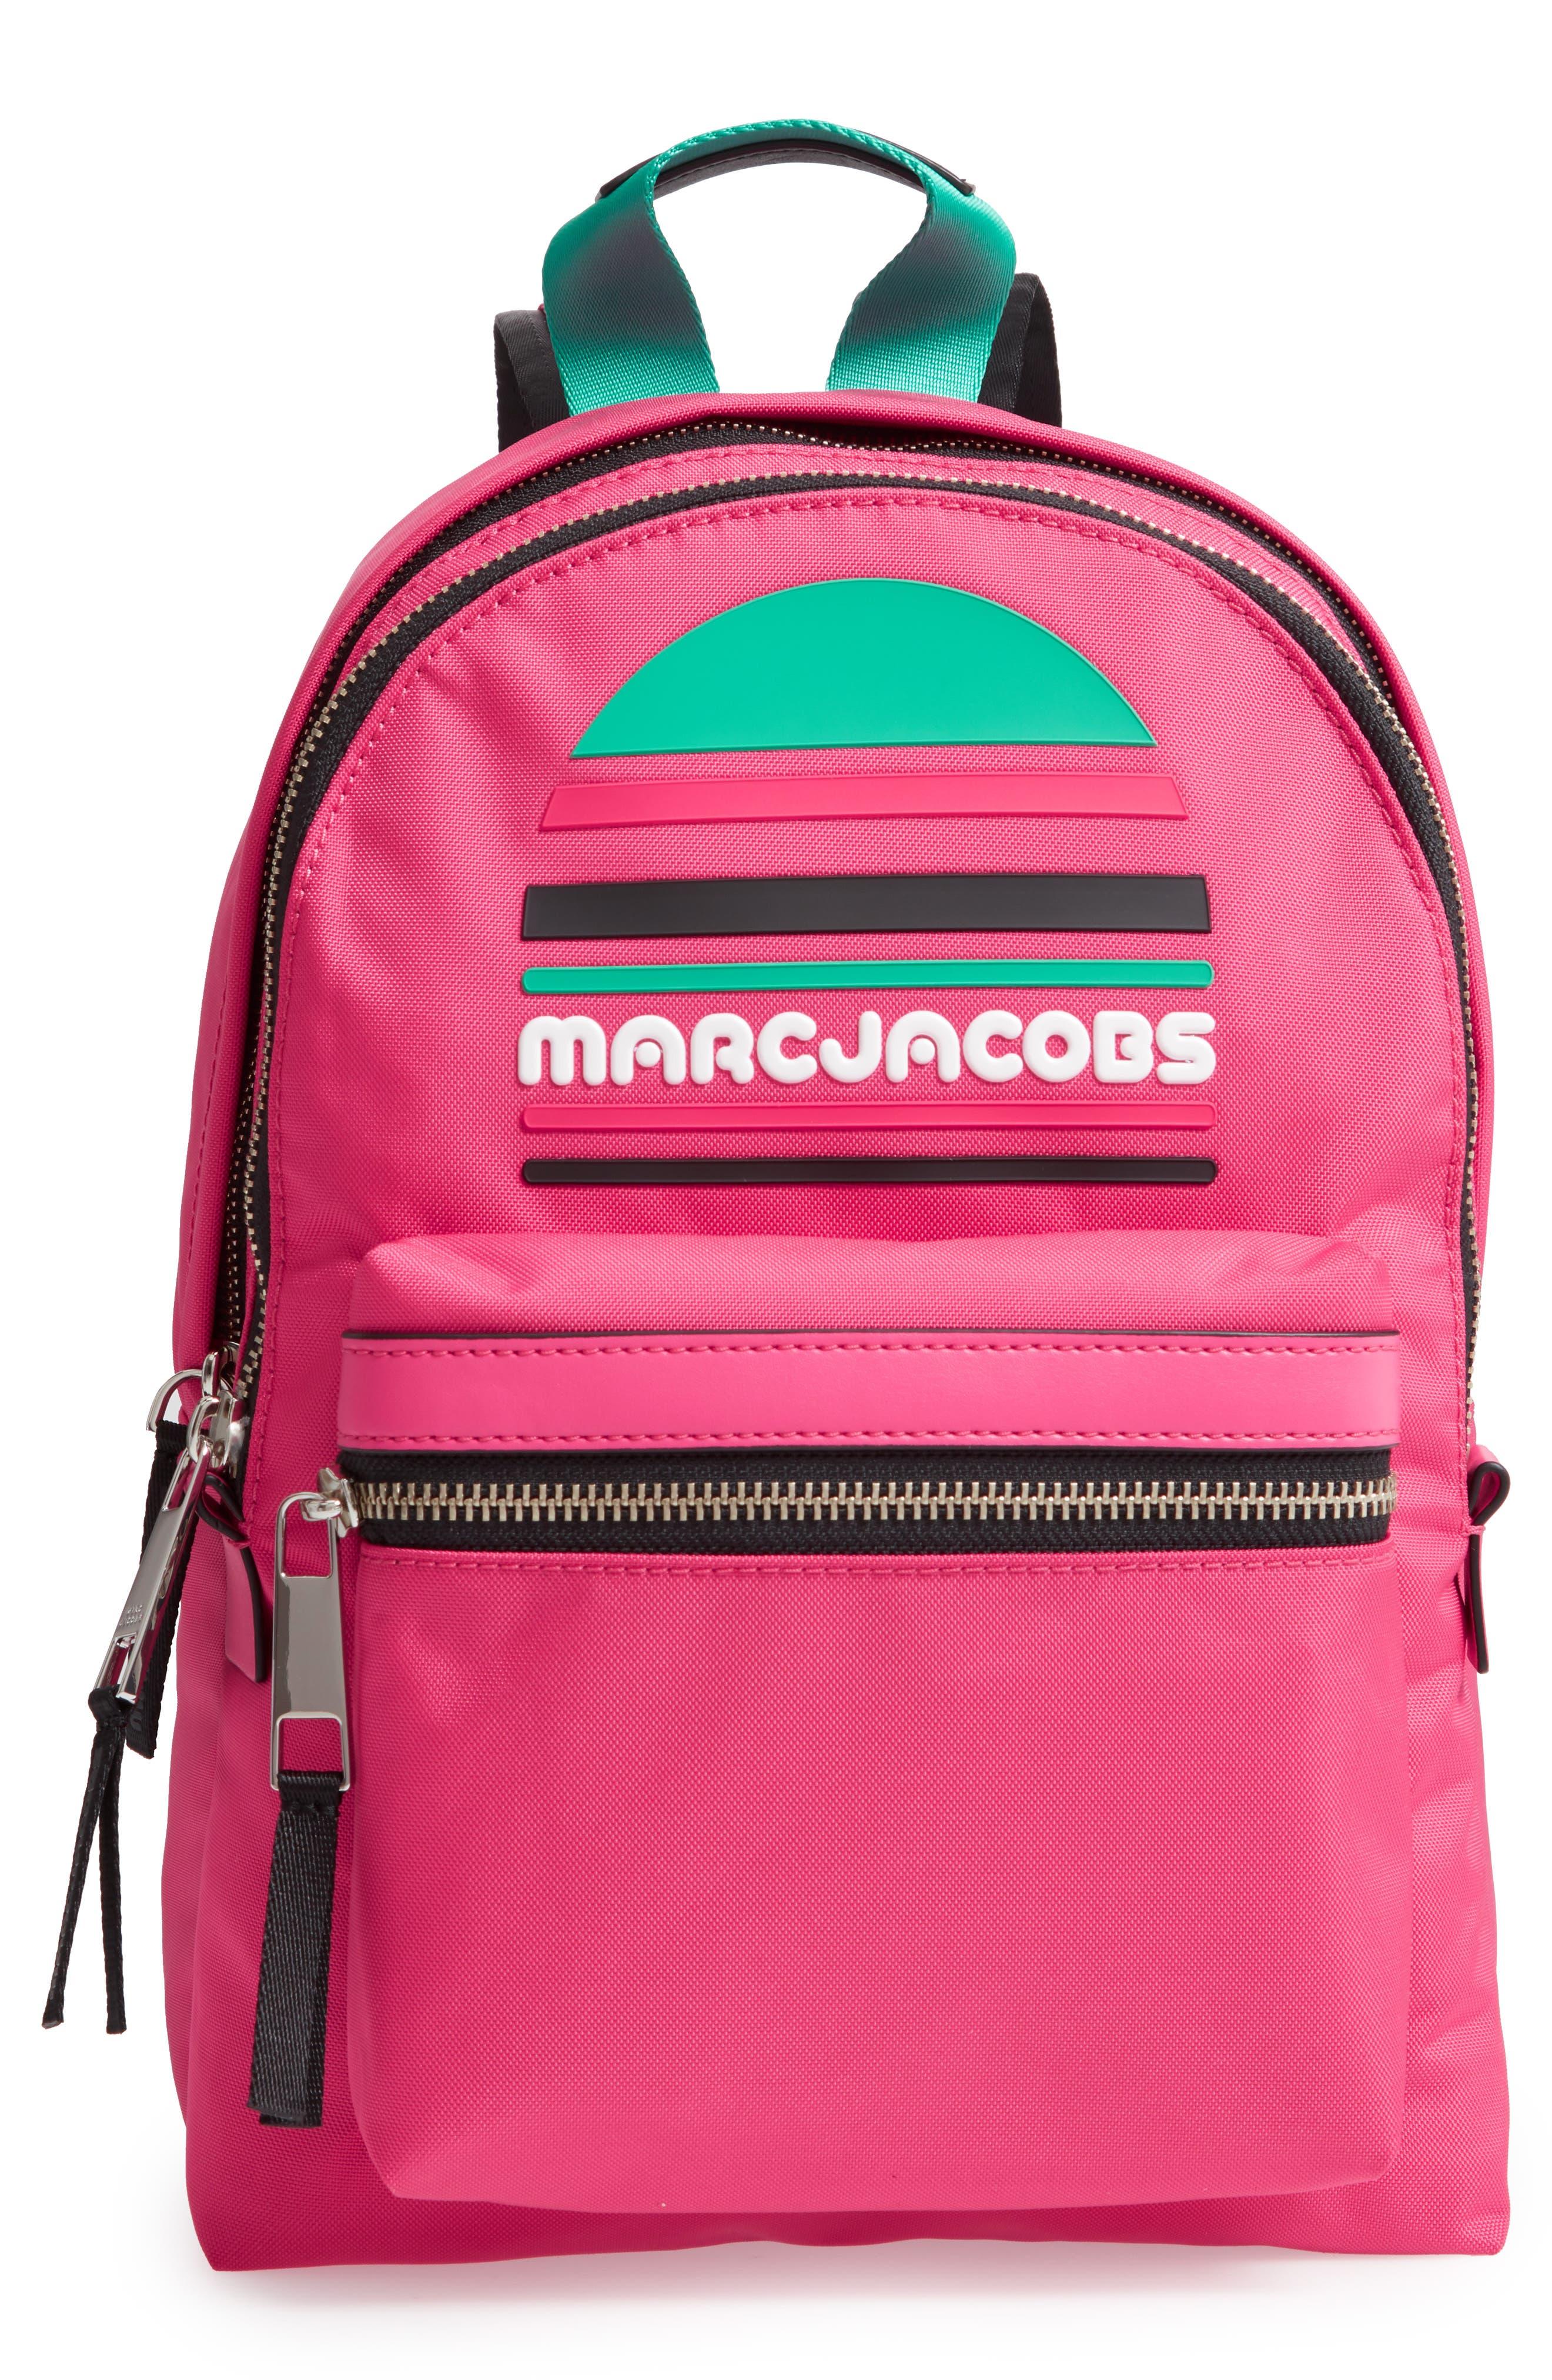 Medium Sport Trek Backpack,                         Main,                         color, PEONY